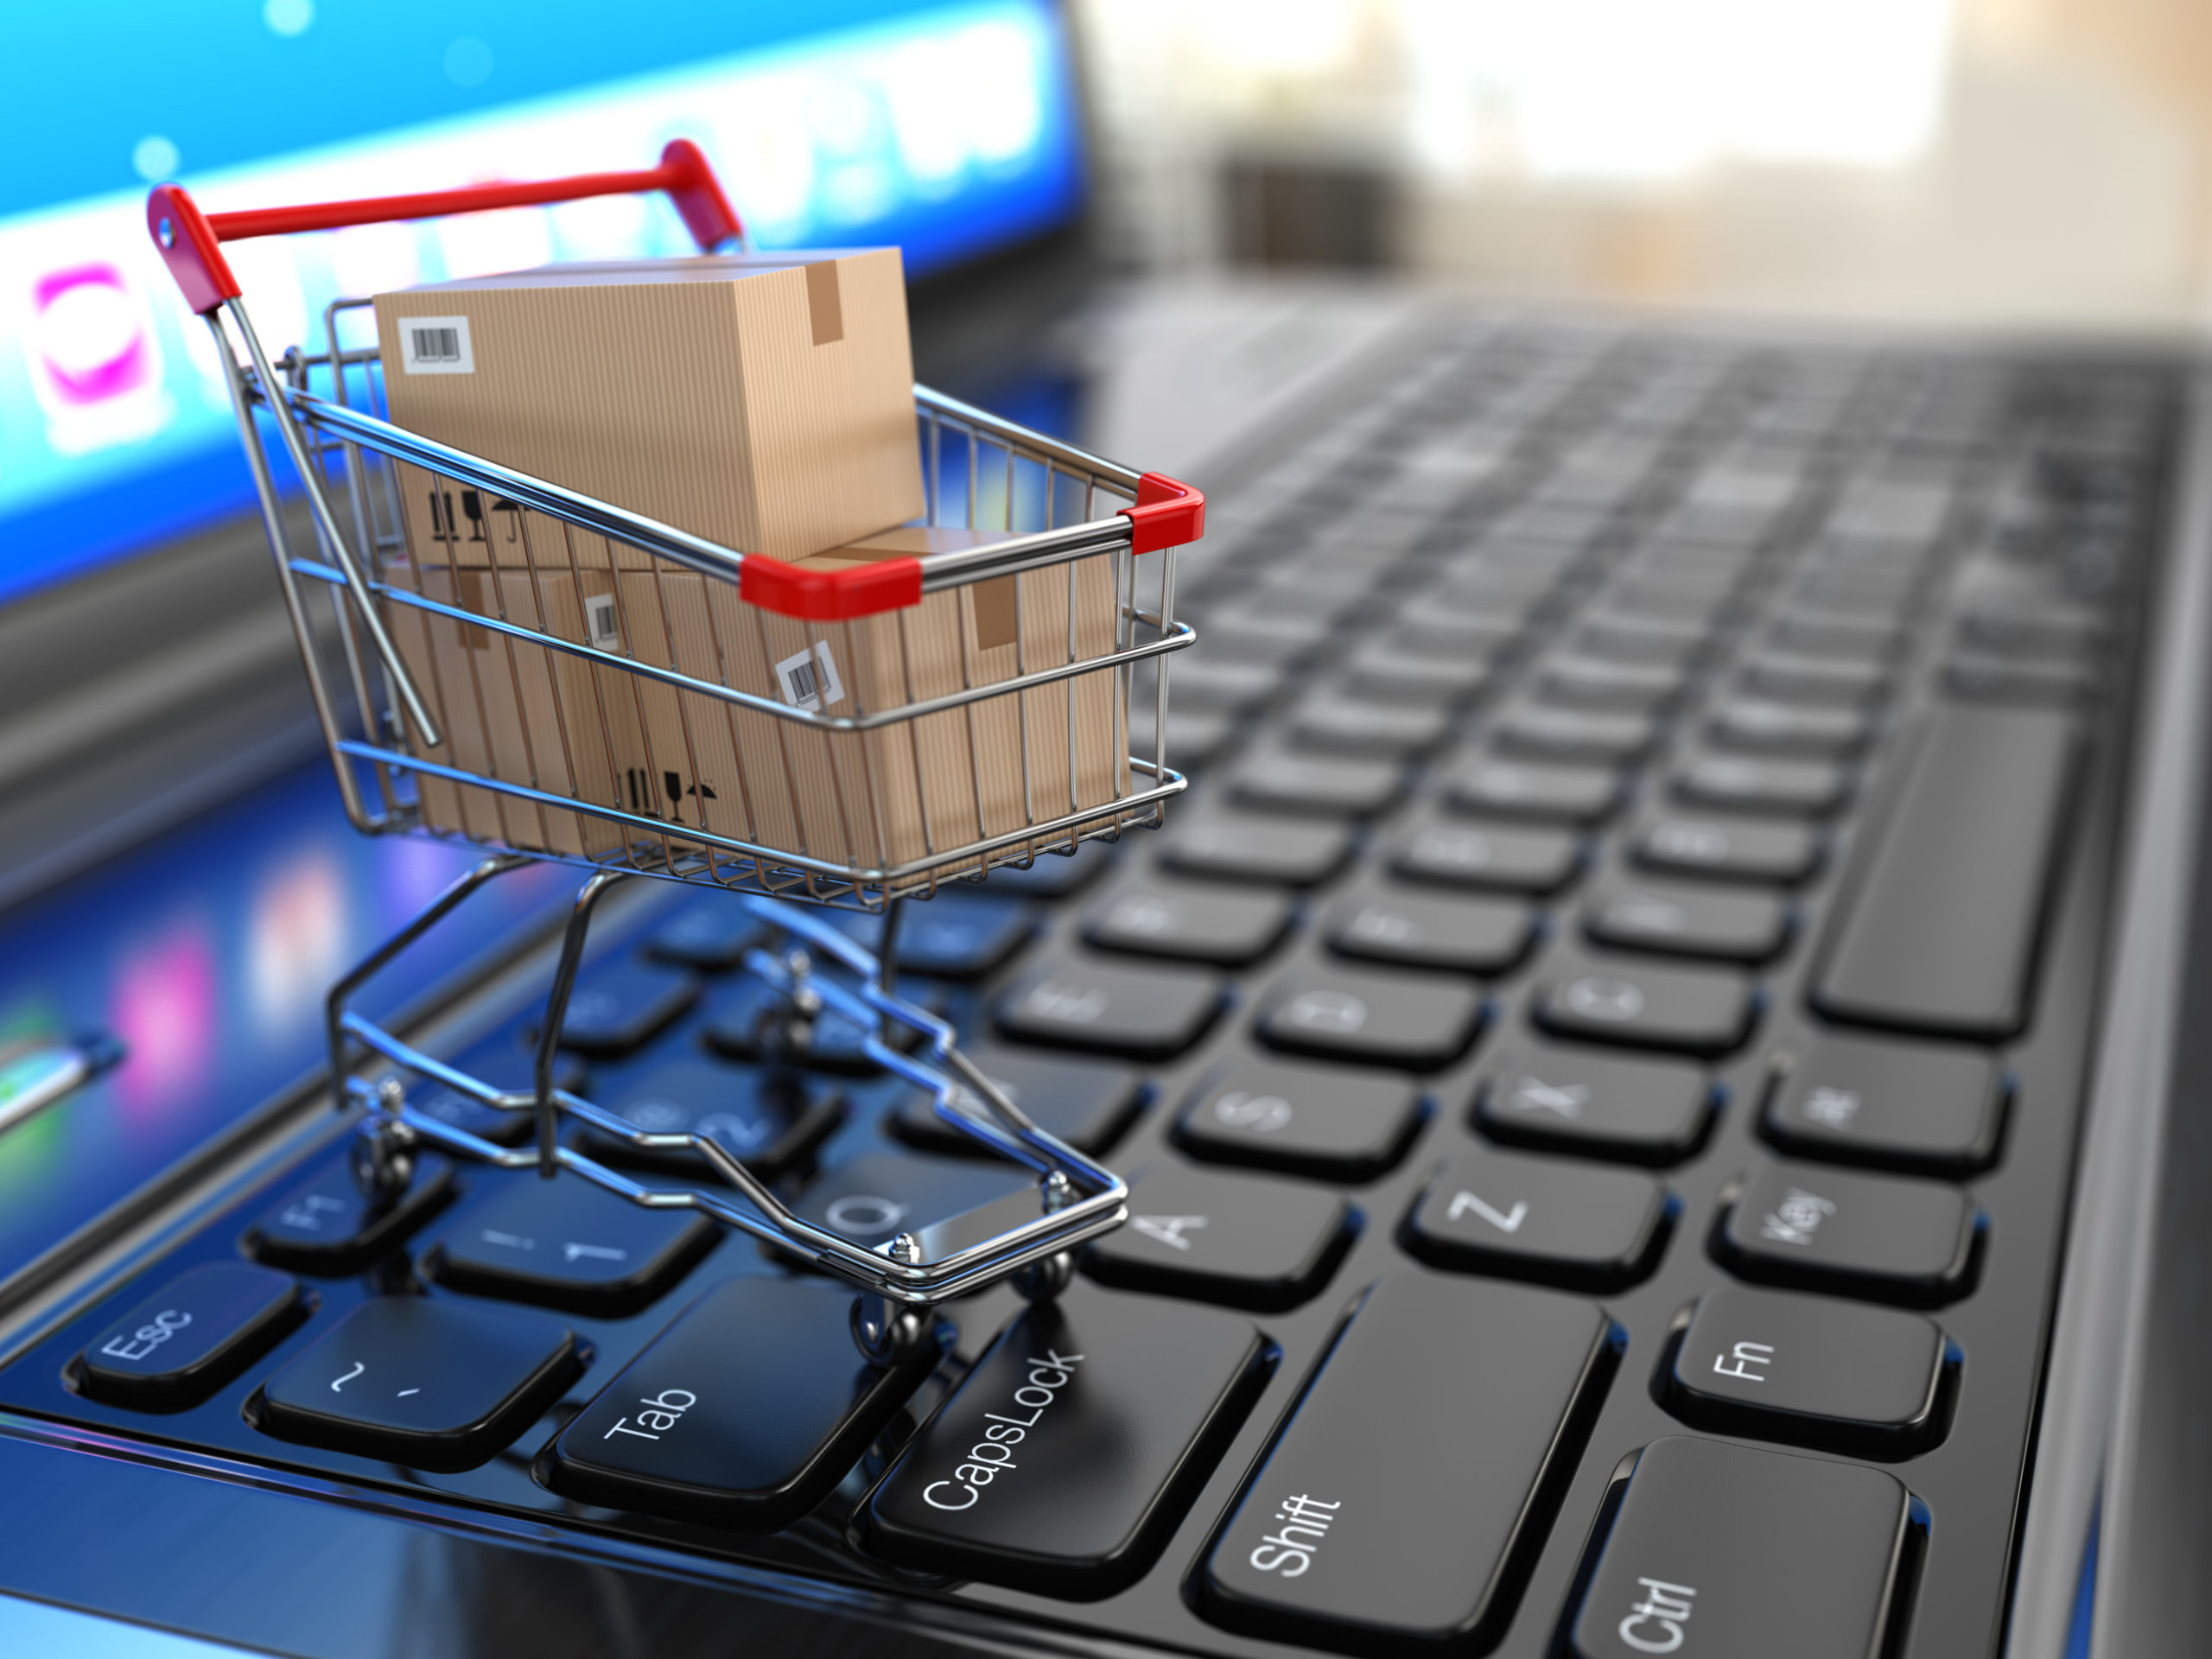 Woocommerce : Comment transformer son site WordPress en E-commerce ?